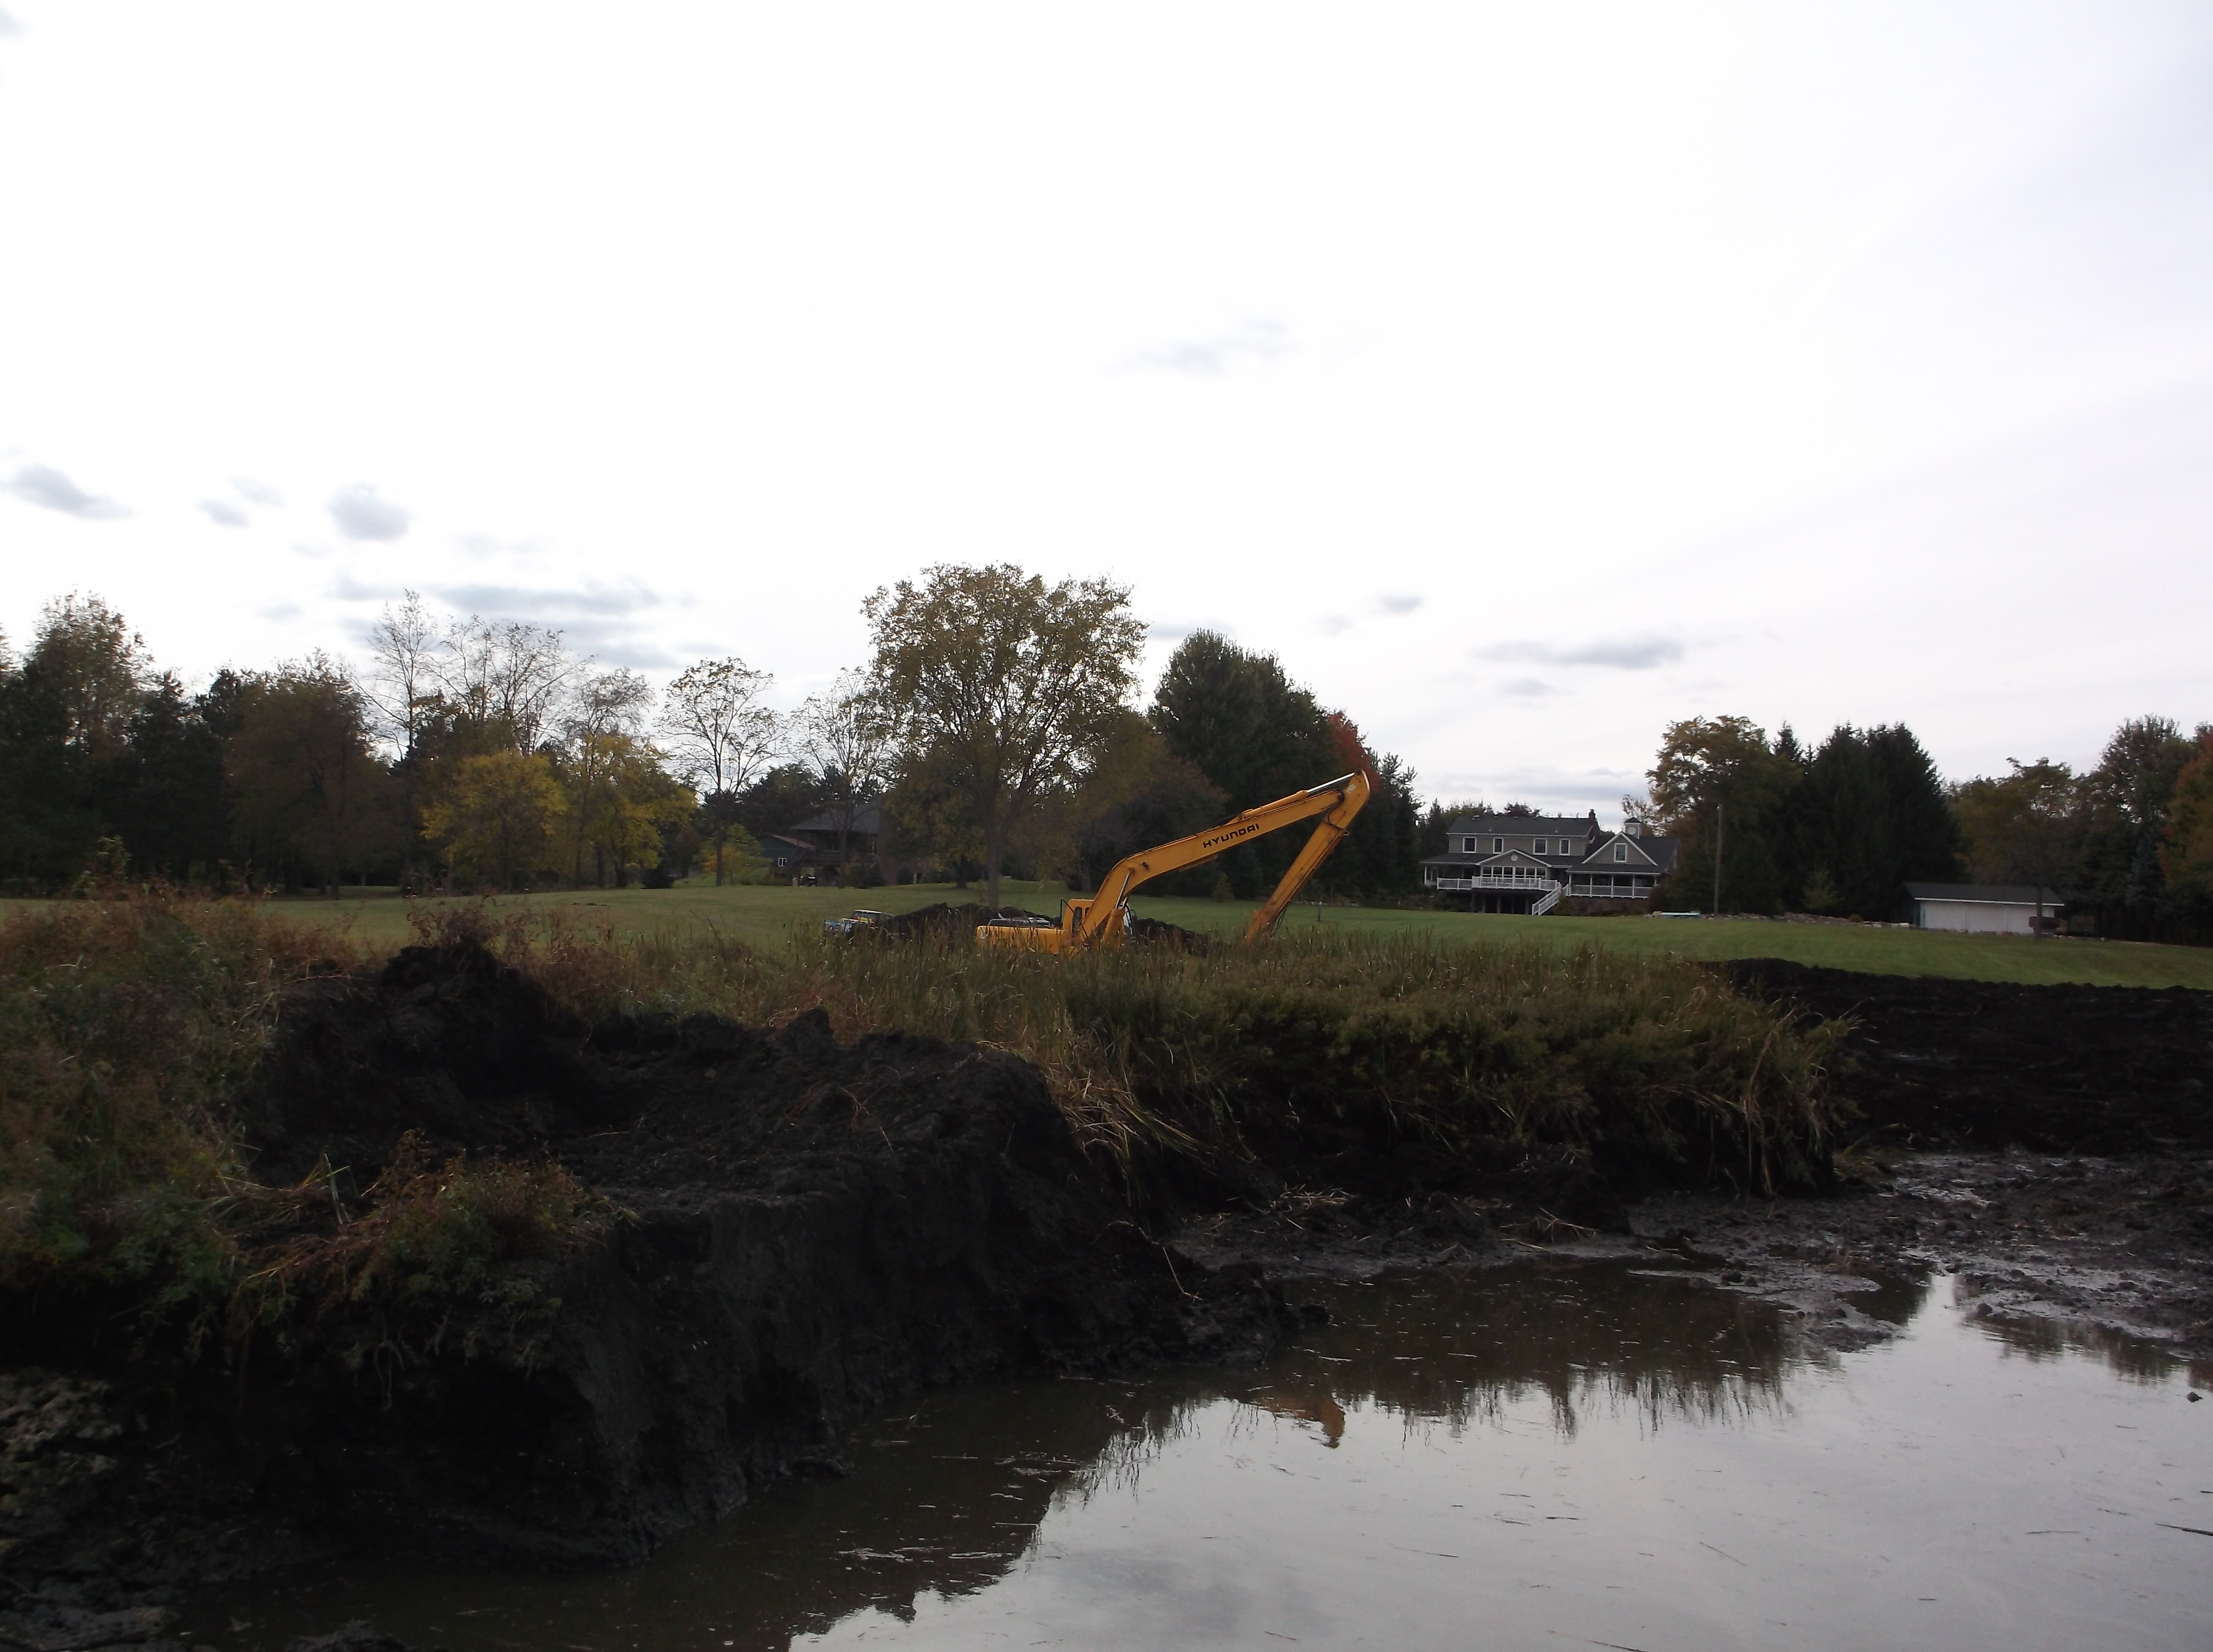 fish_pond_excavation_Plymouth_Michigan_105.jpg